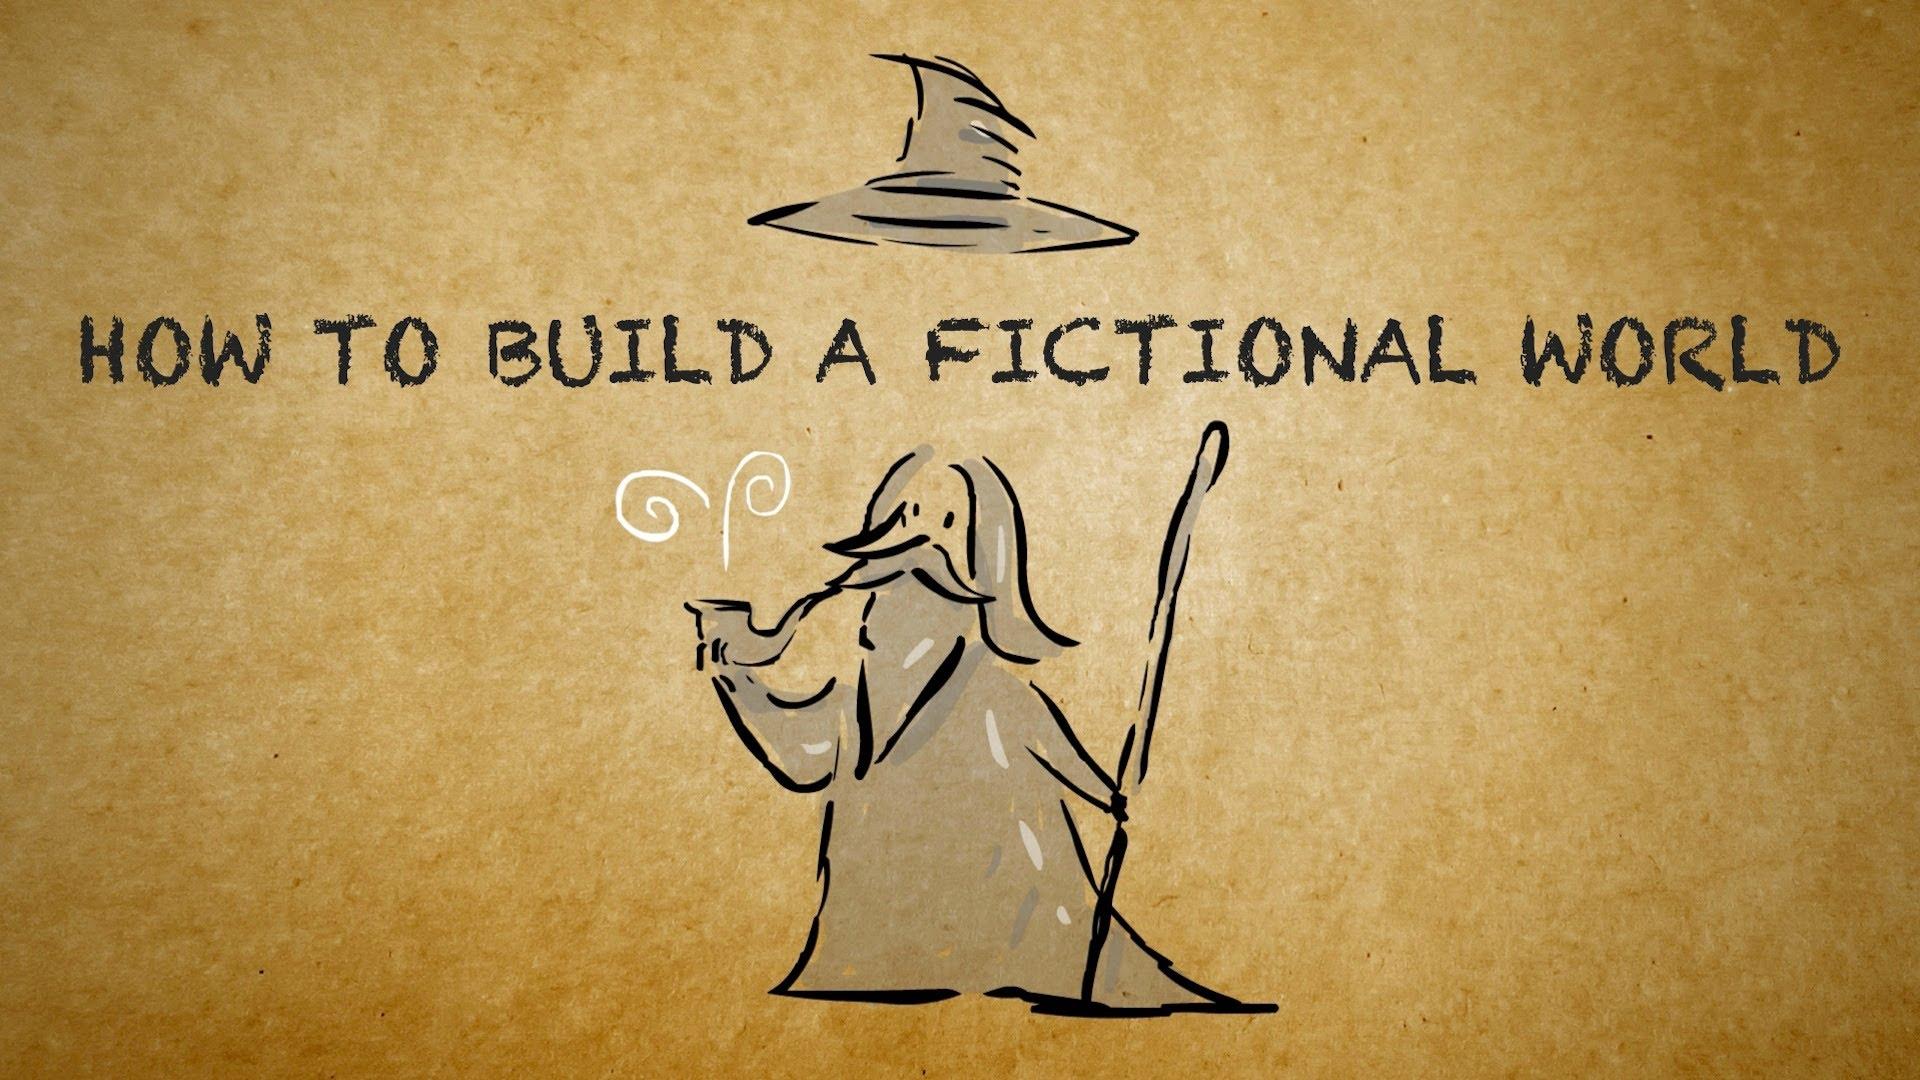 【TED-Ed】次世代のJ.K.ローリングはあなた!フィクション世界の作り方